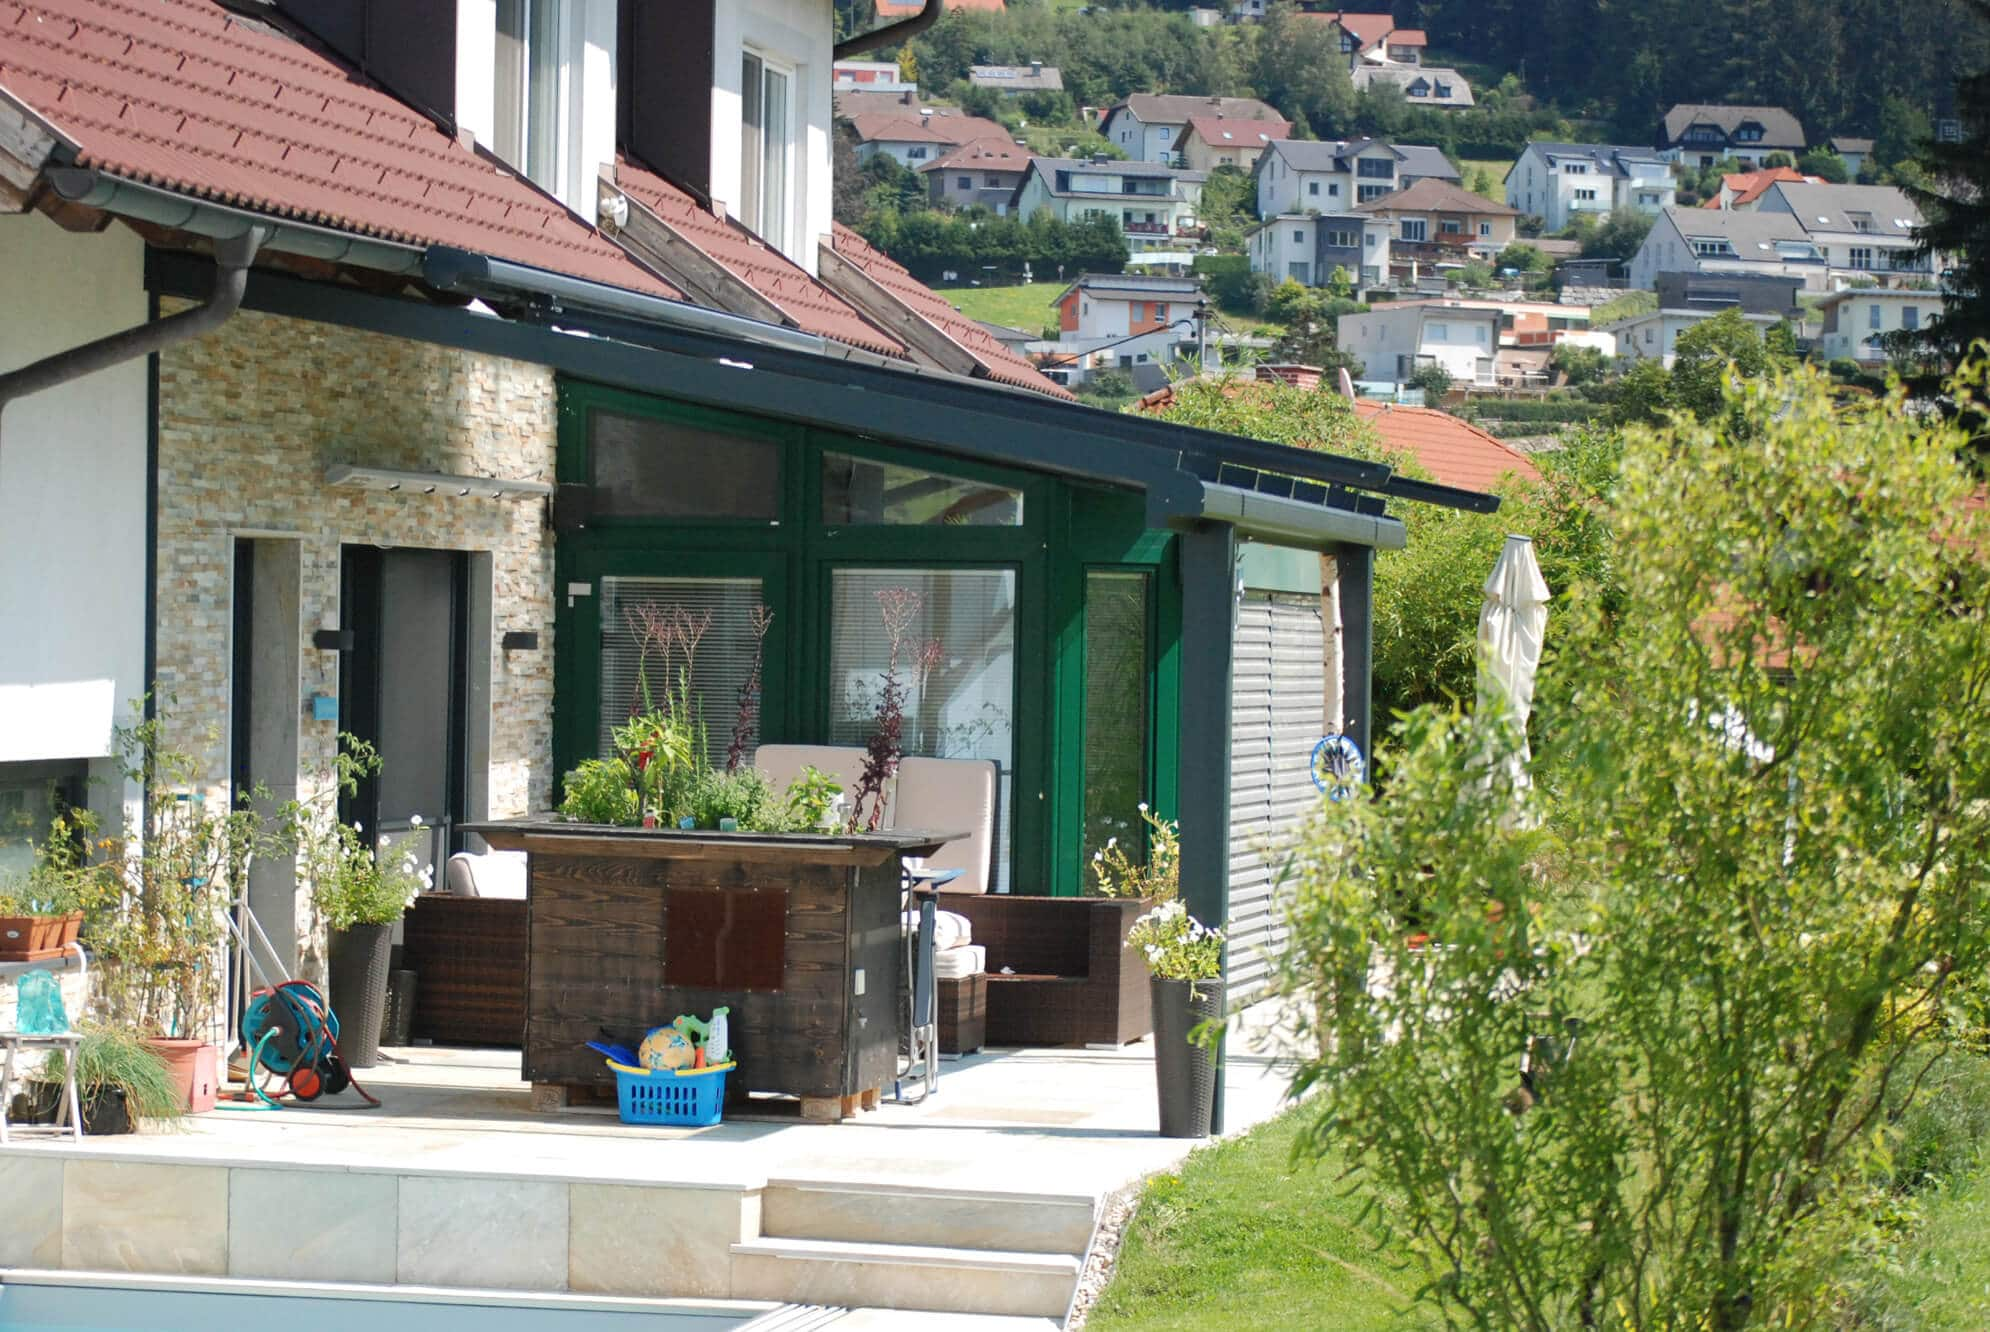 laubengang mit windschutz aus glas glasfassaden vom erzeuger. Black Bedroom Furniture Sets. Home Design Ideas